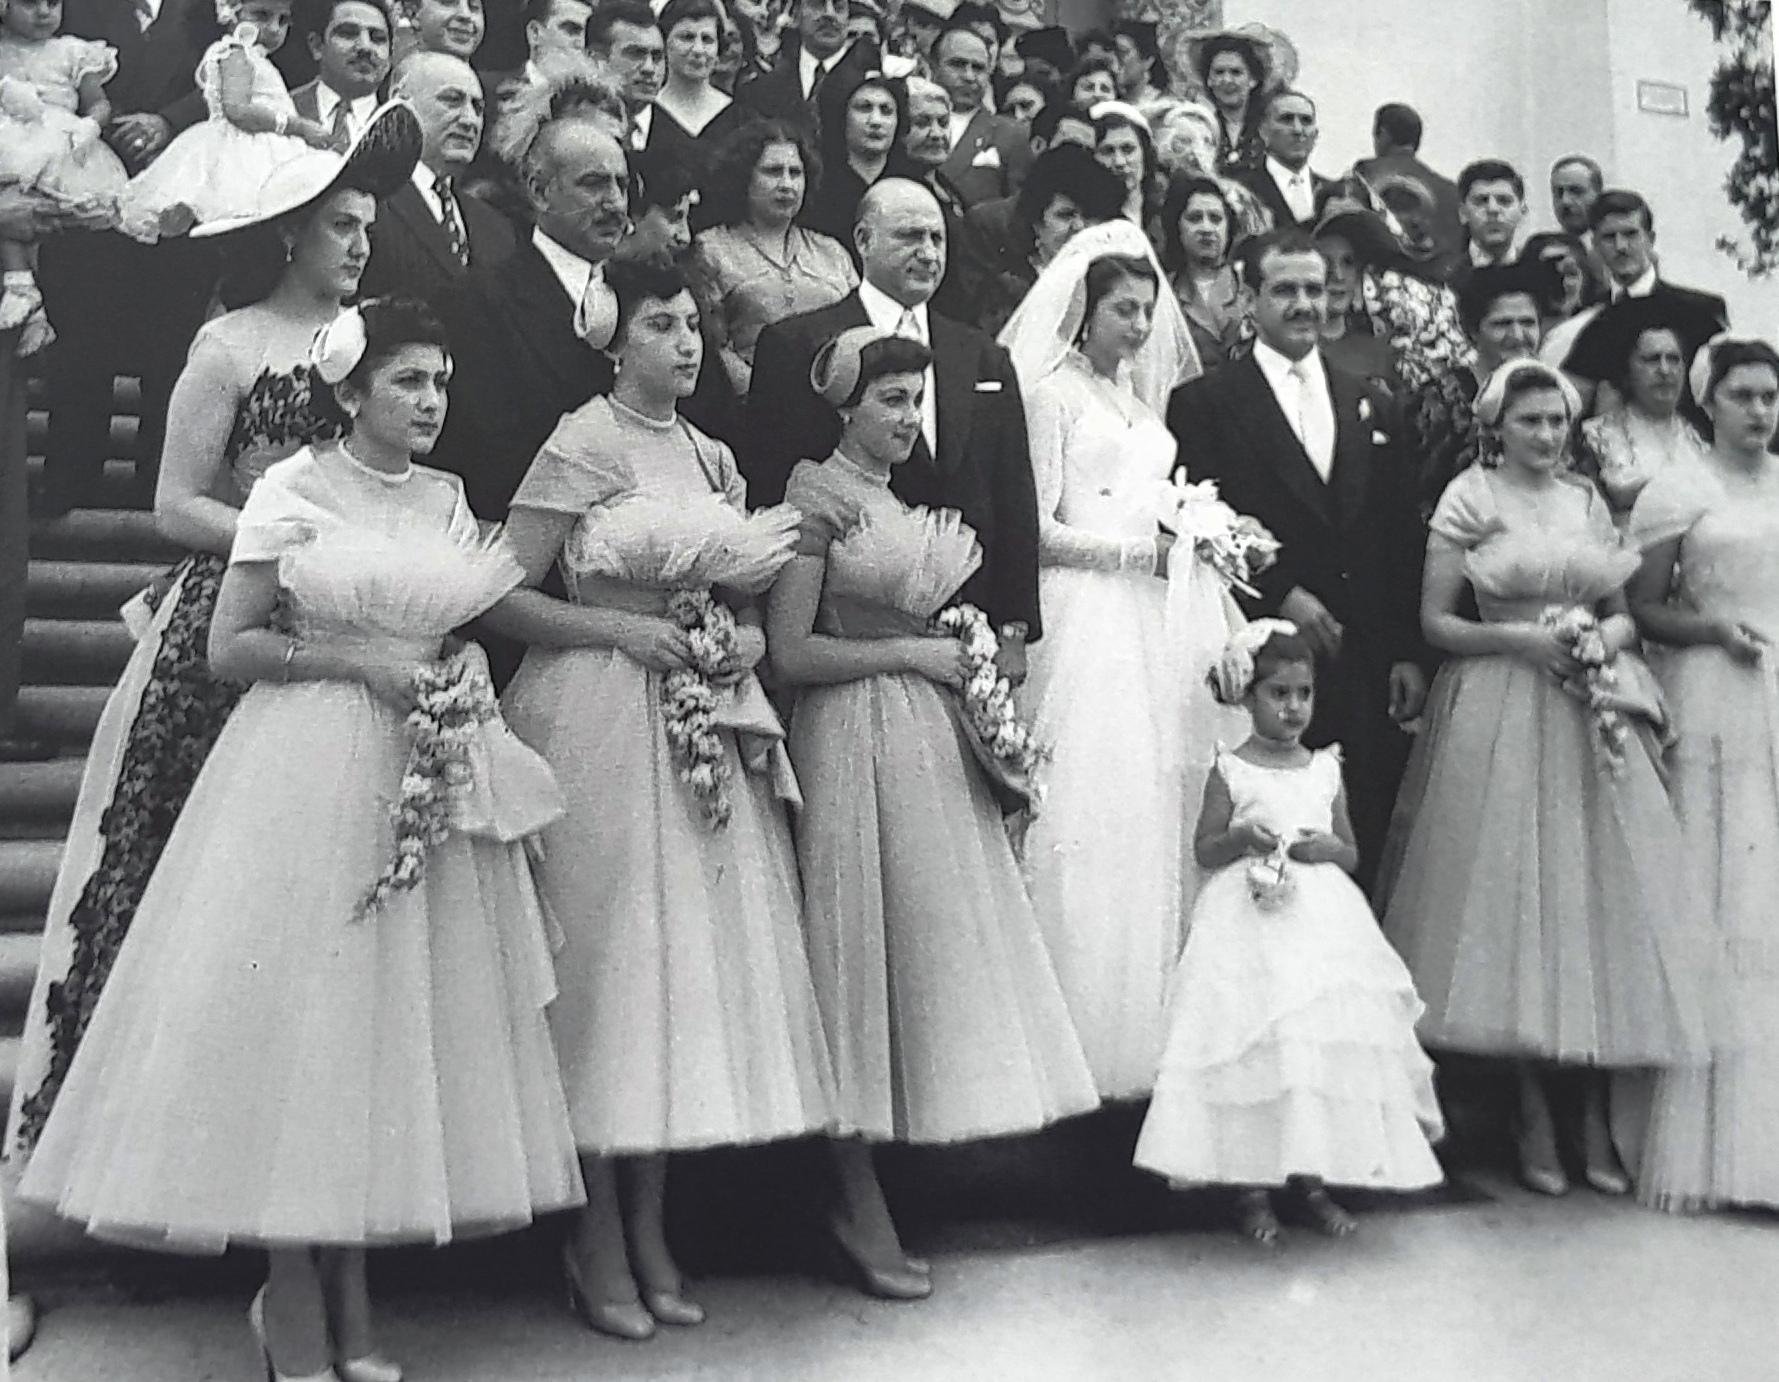 MATRIMONIO DE DON ASIS ABRAHAM DAGUER Y DOÑA FLORITA MAFUD JORGE